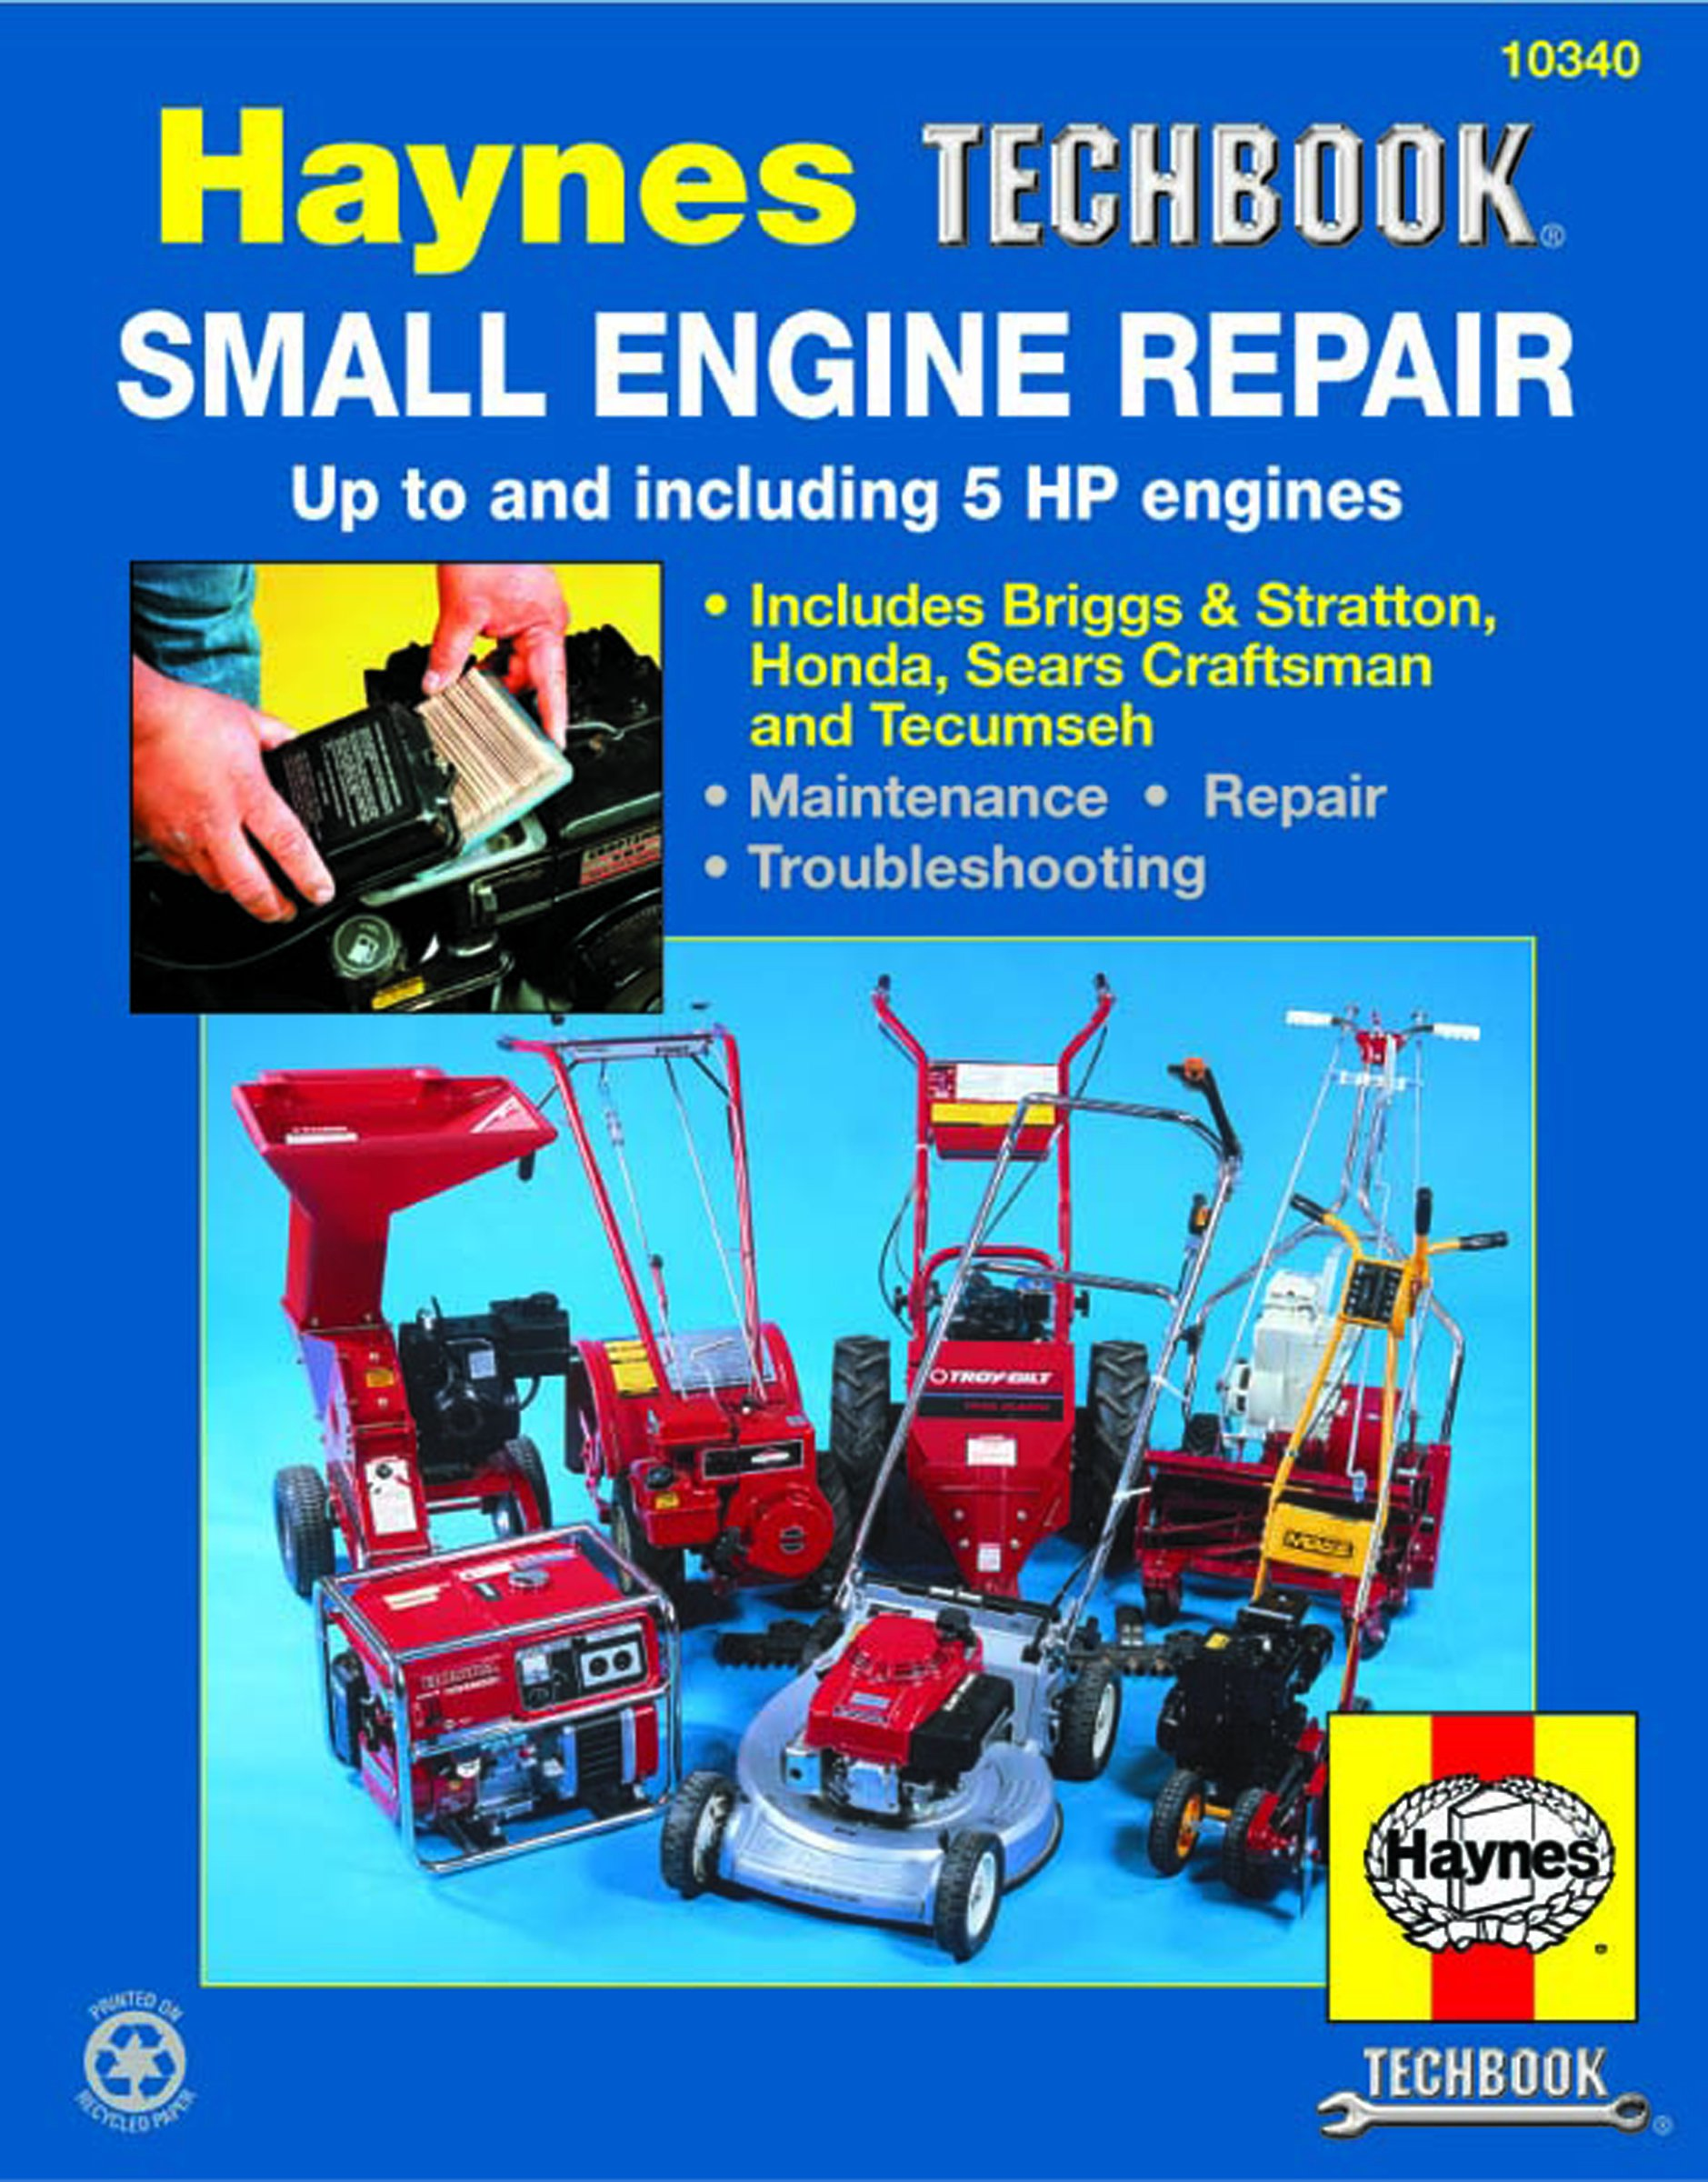 Haynes Techbook Small Engine Repair Manual  Up To 5 Hp